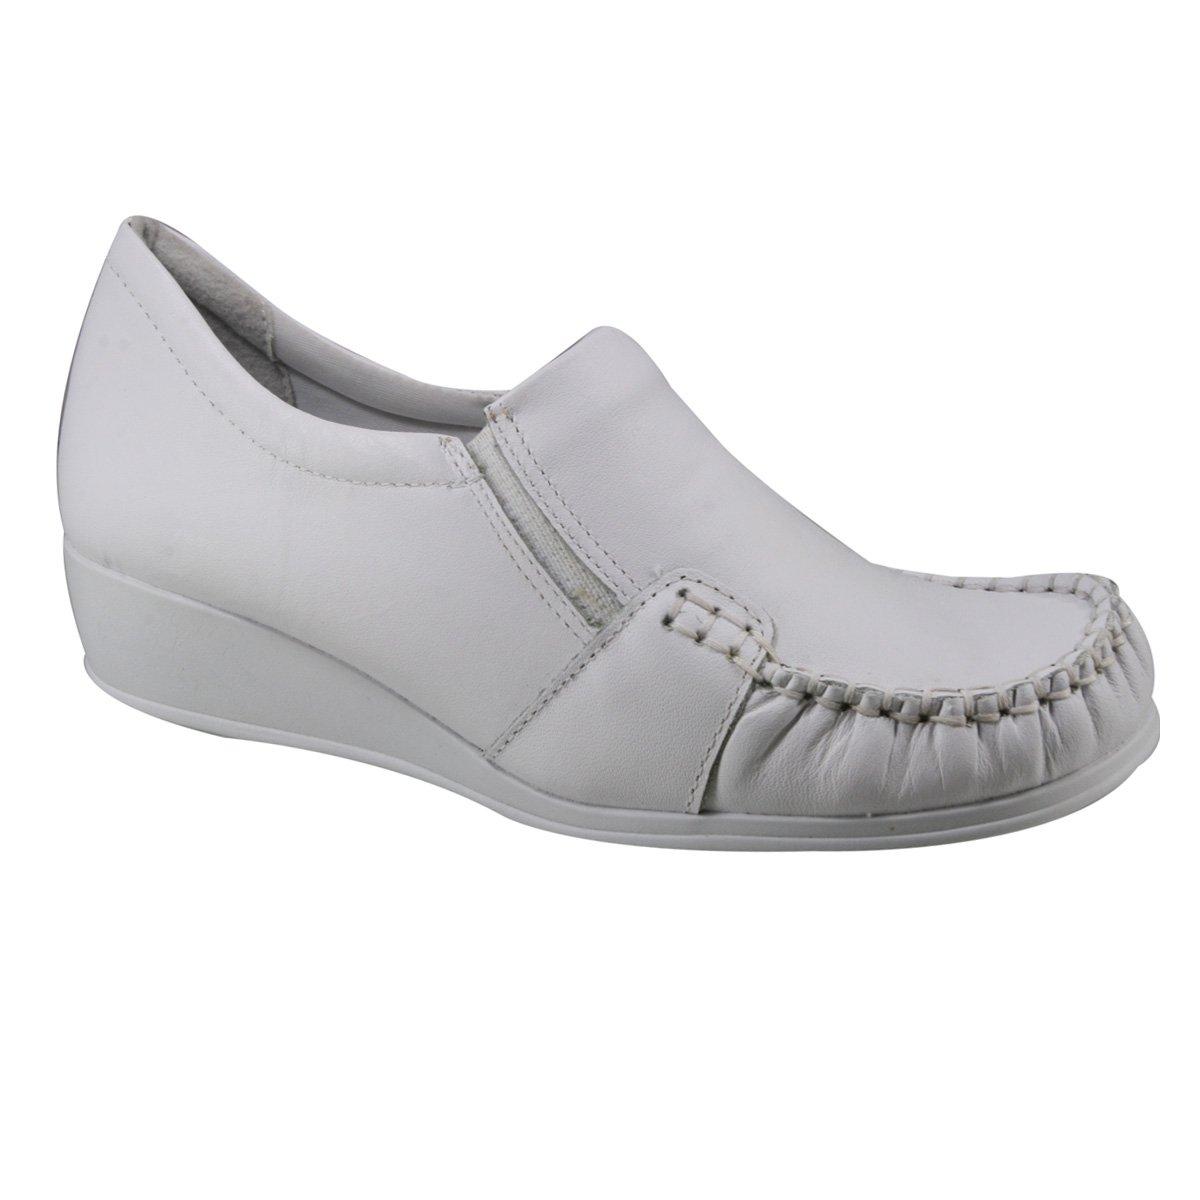 bce1cb37b1 Sapato Comfortflex Anabela